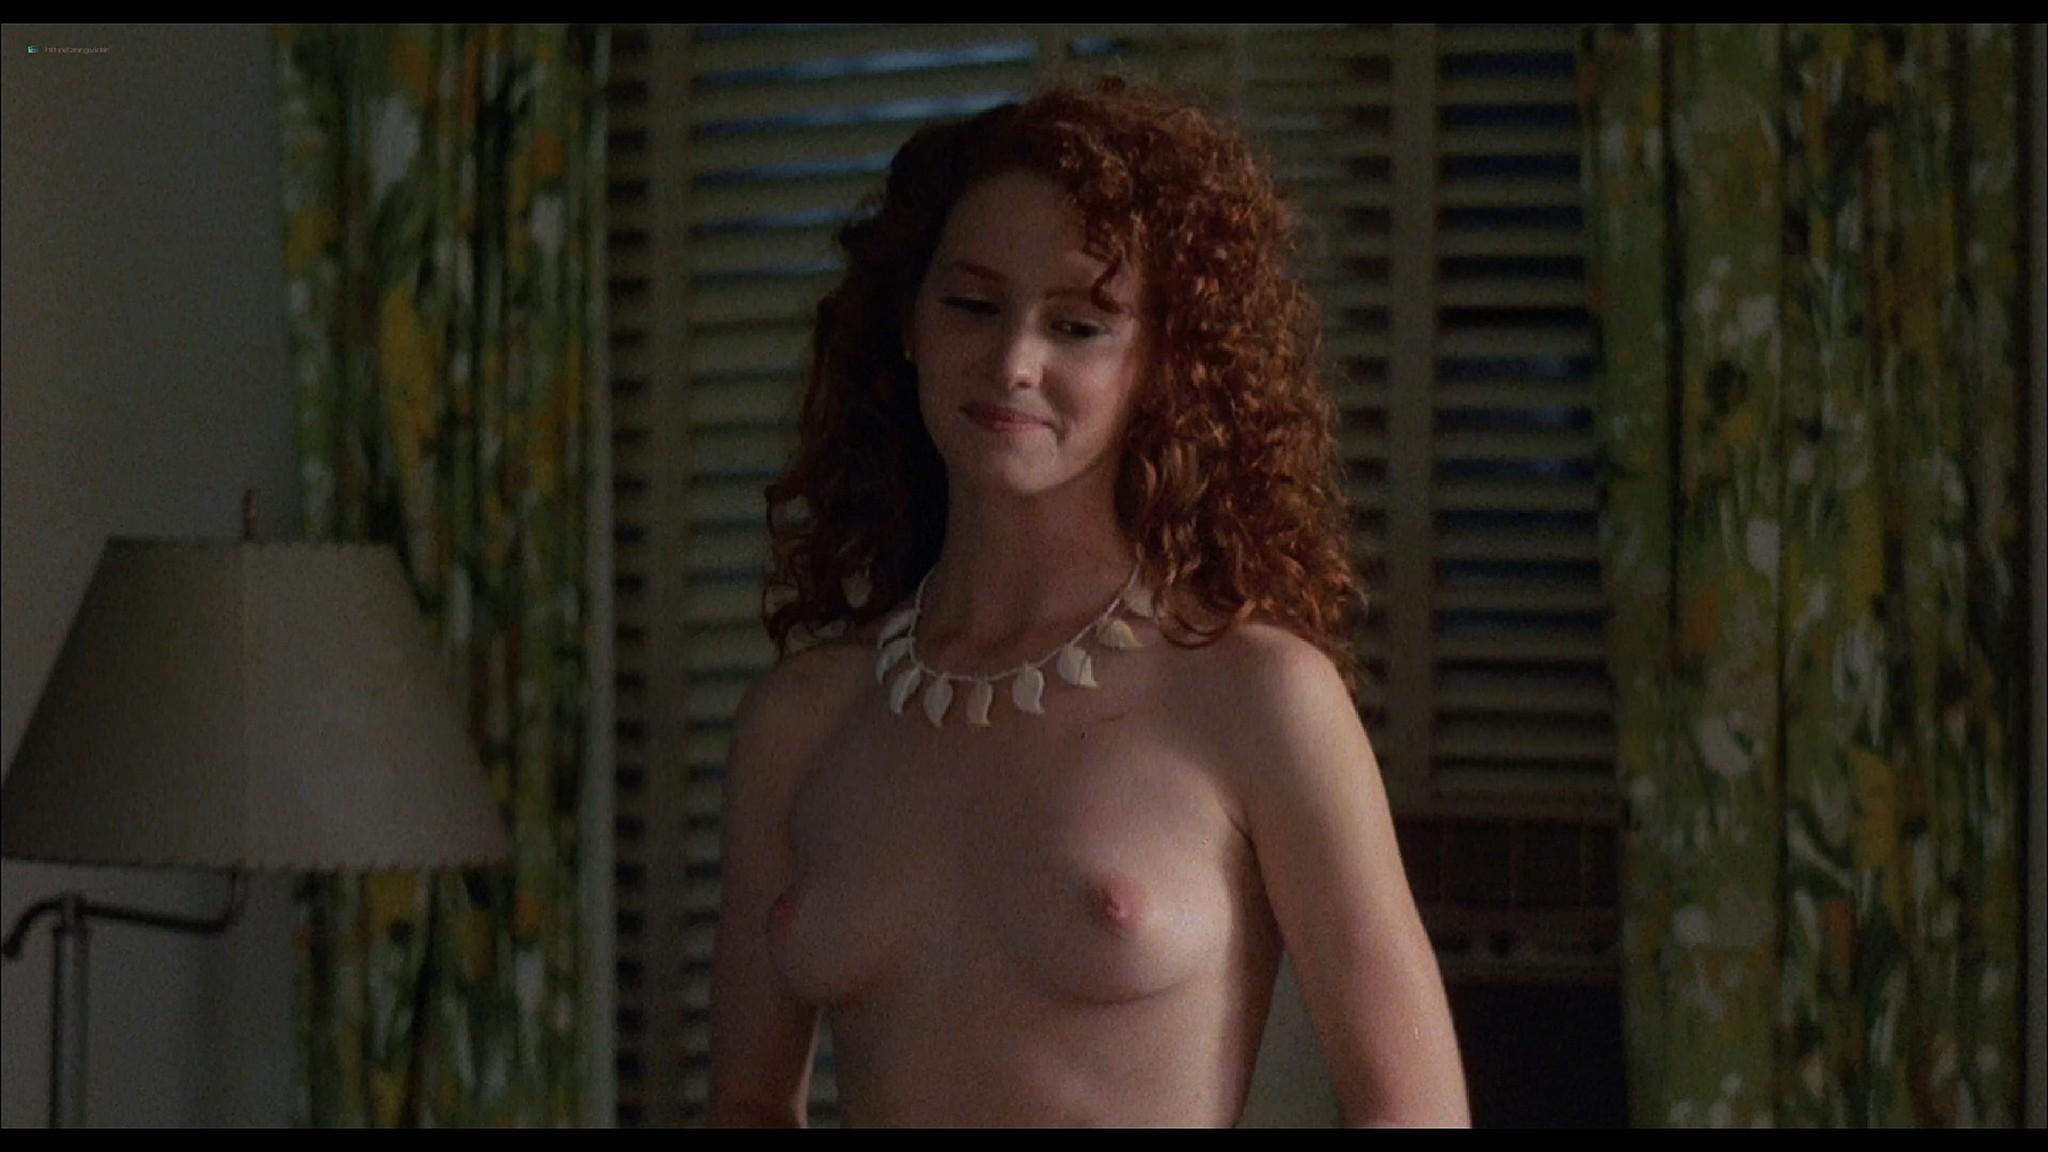 Breaking Nudes